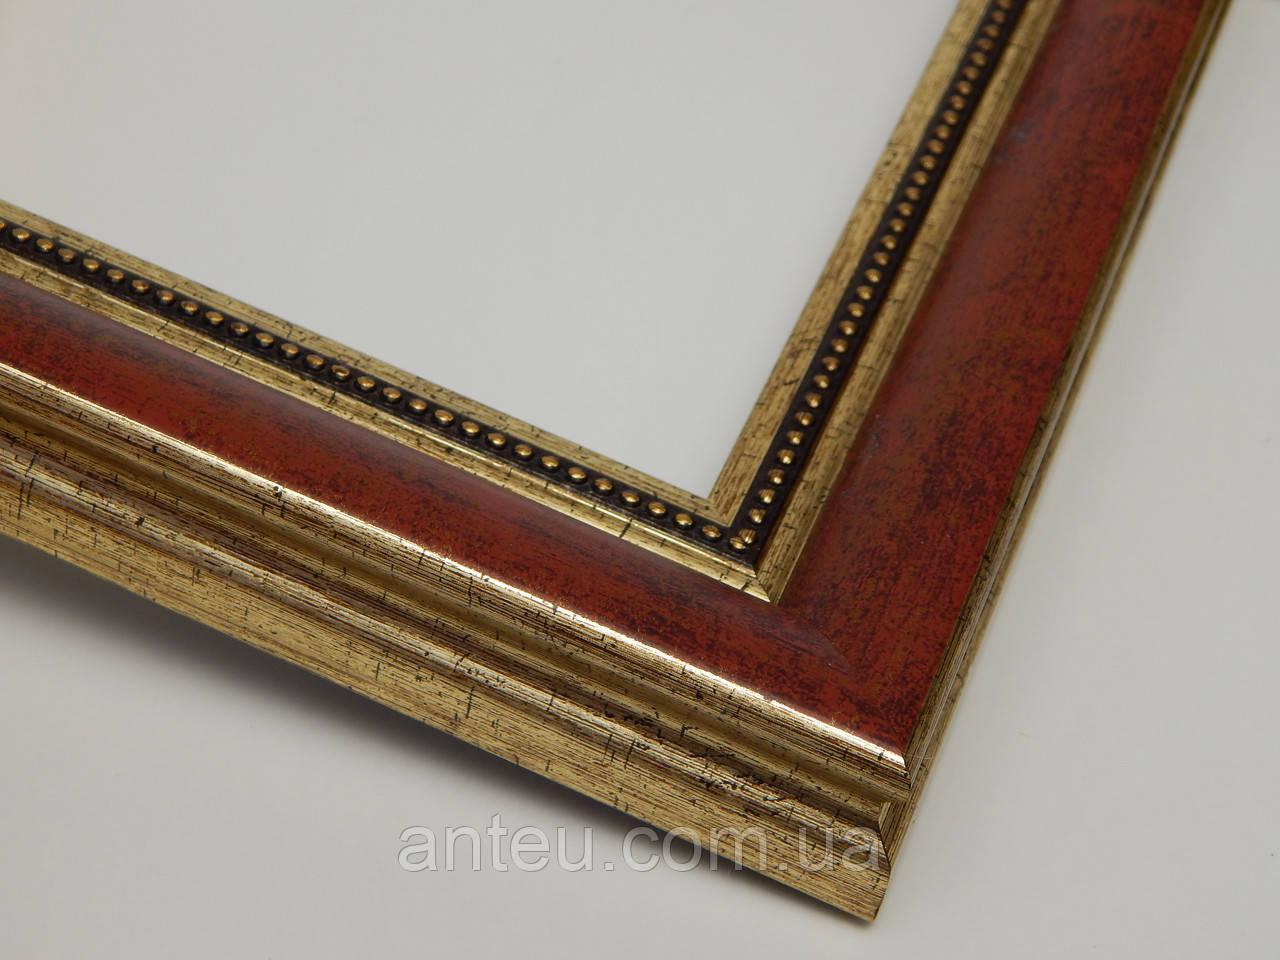 РАМКА А3 (297х420).25 мм.Золото яркое с орнаментом.Для фото,дипломов,картин.